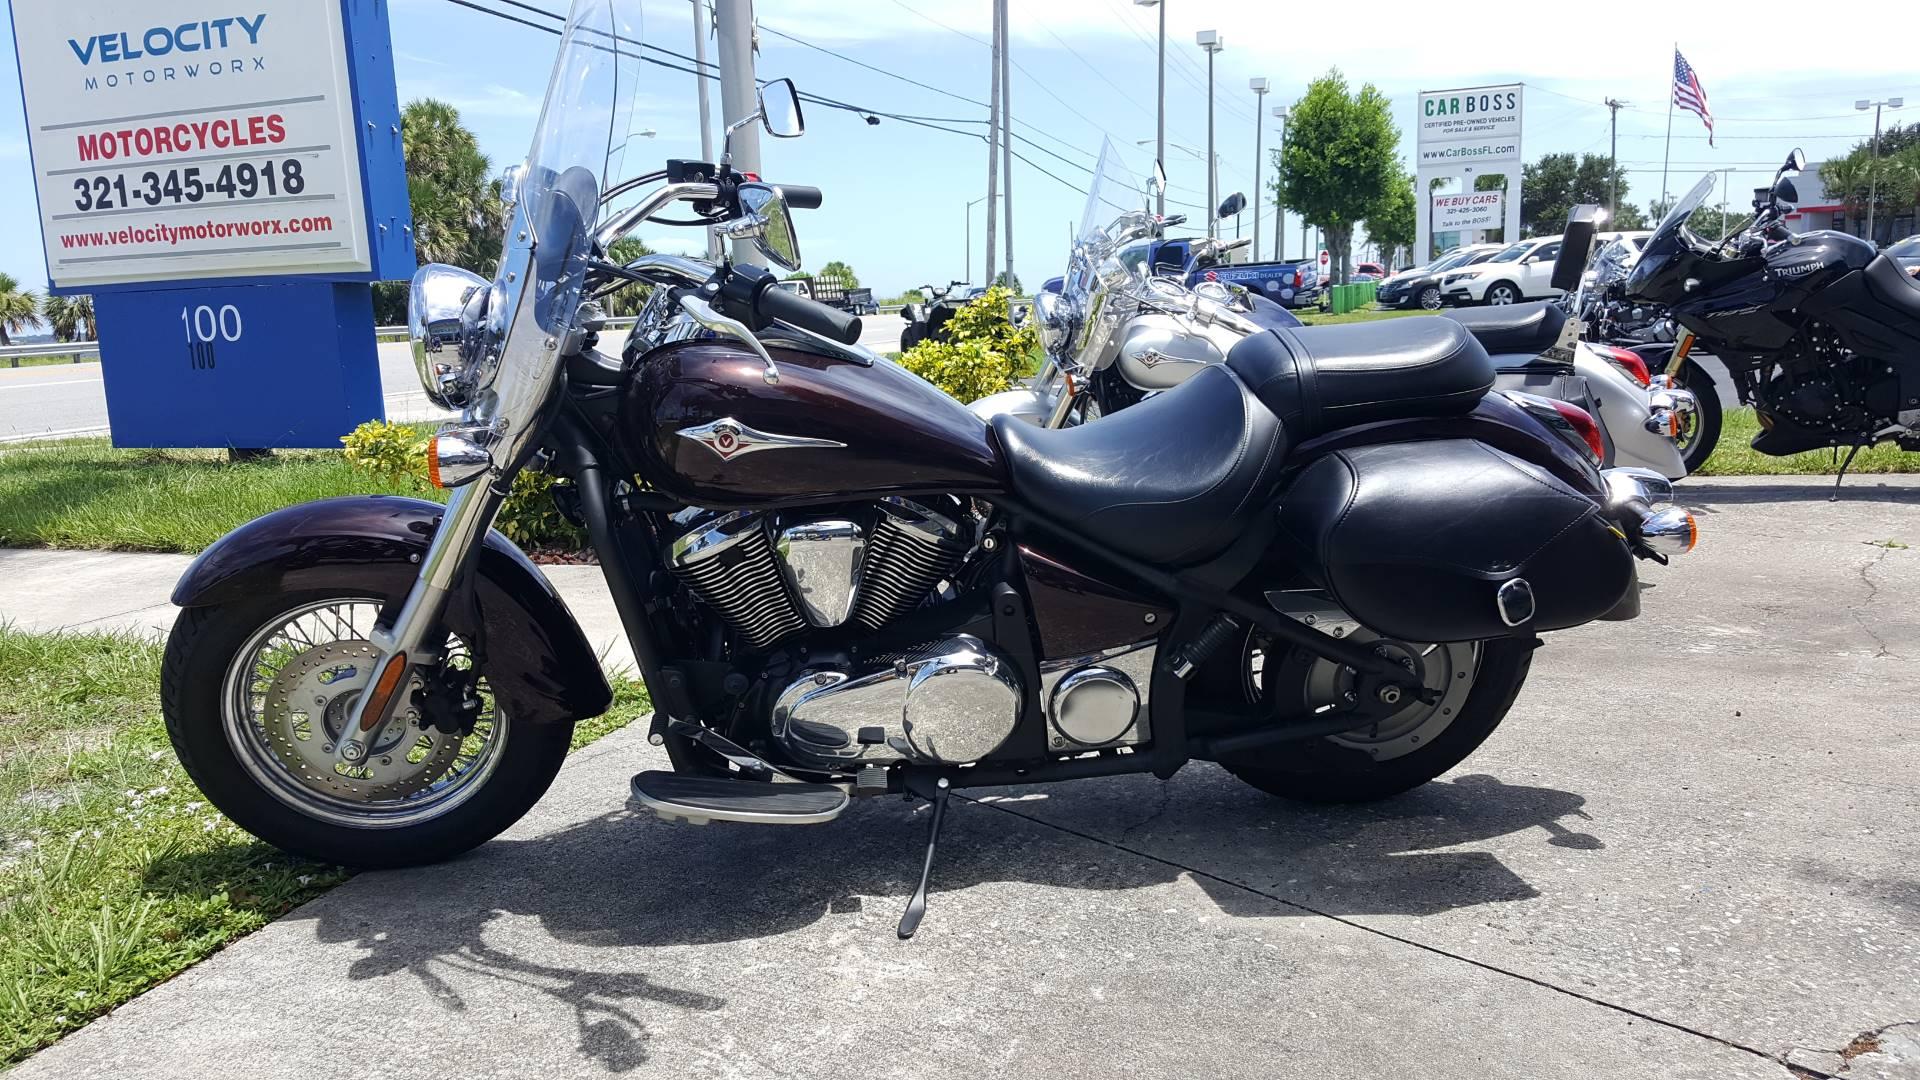 New 2012 Kawasaki Vulcan® 900 Classic Motorcycles in Melbourne, FL ...